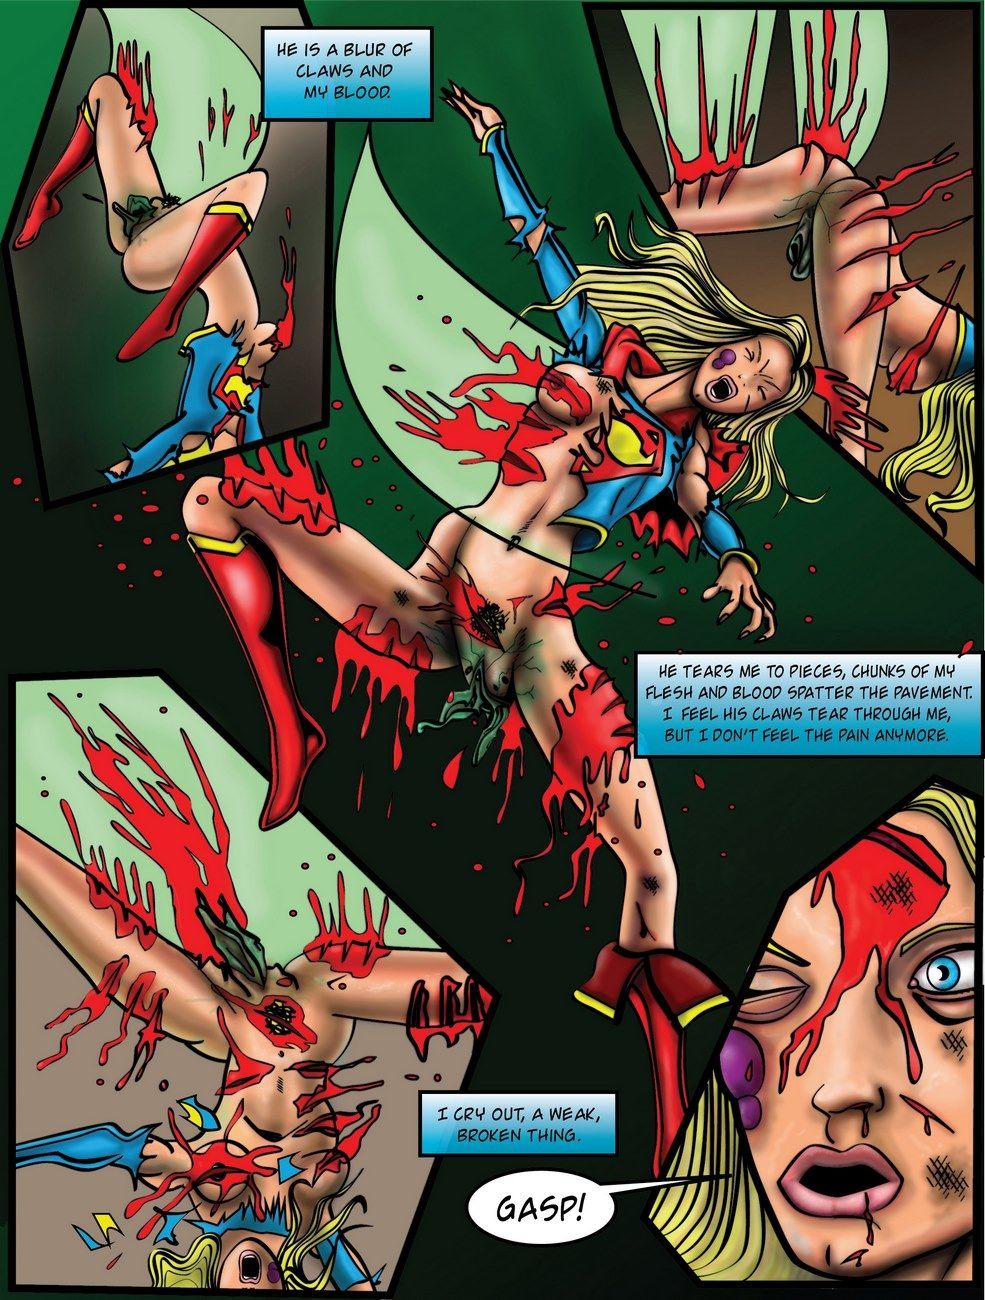 Supergirl sex demon nude images